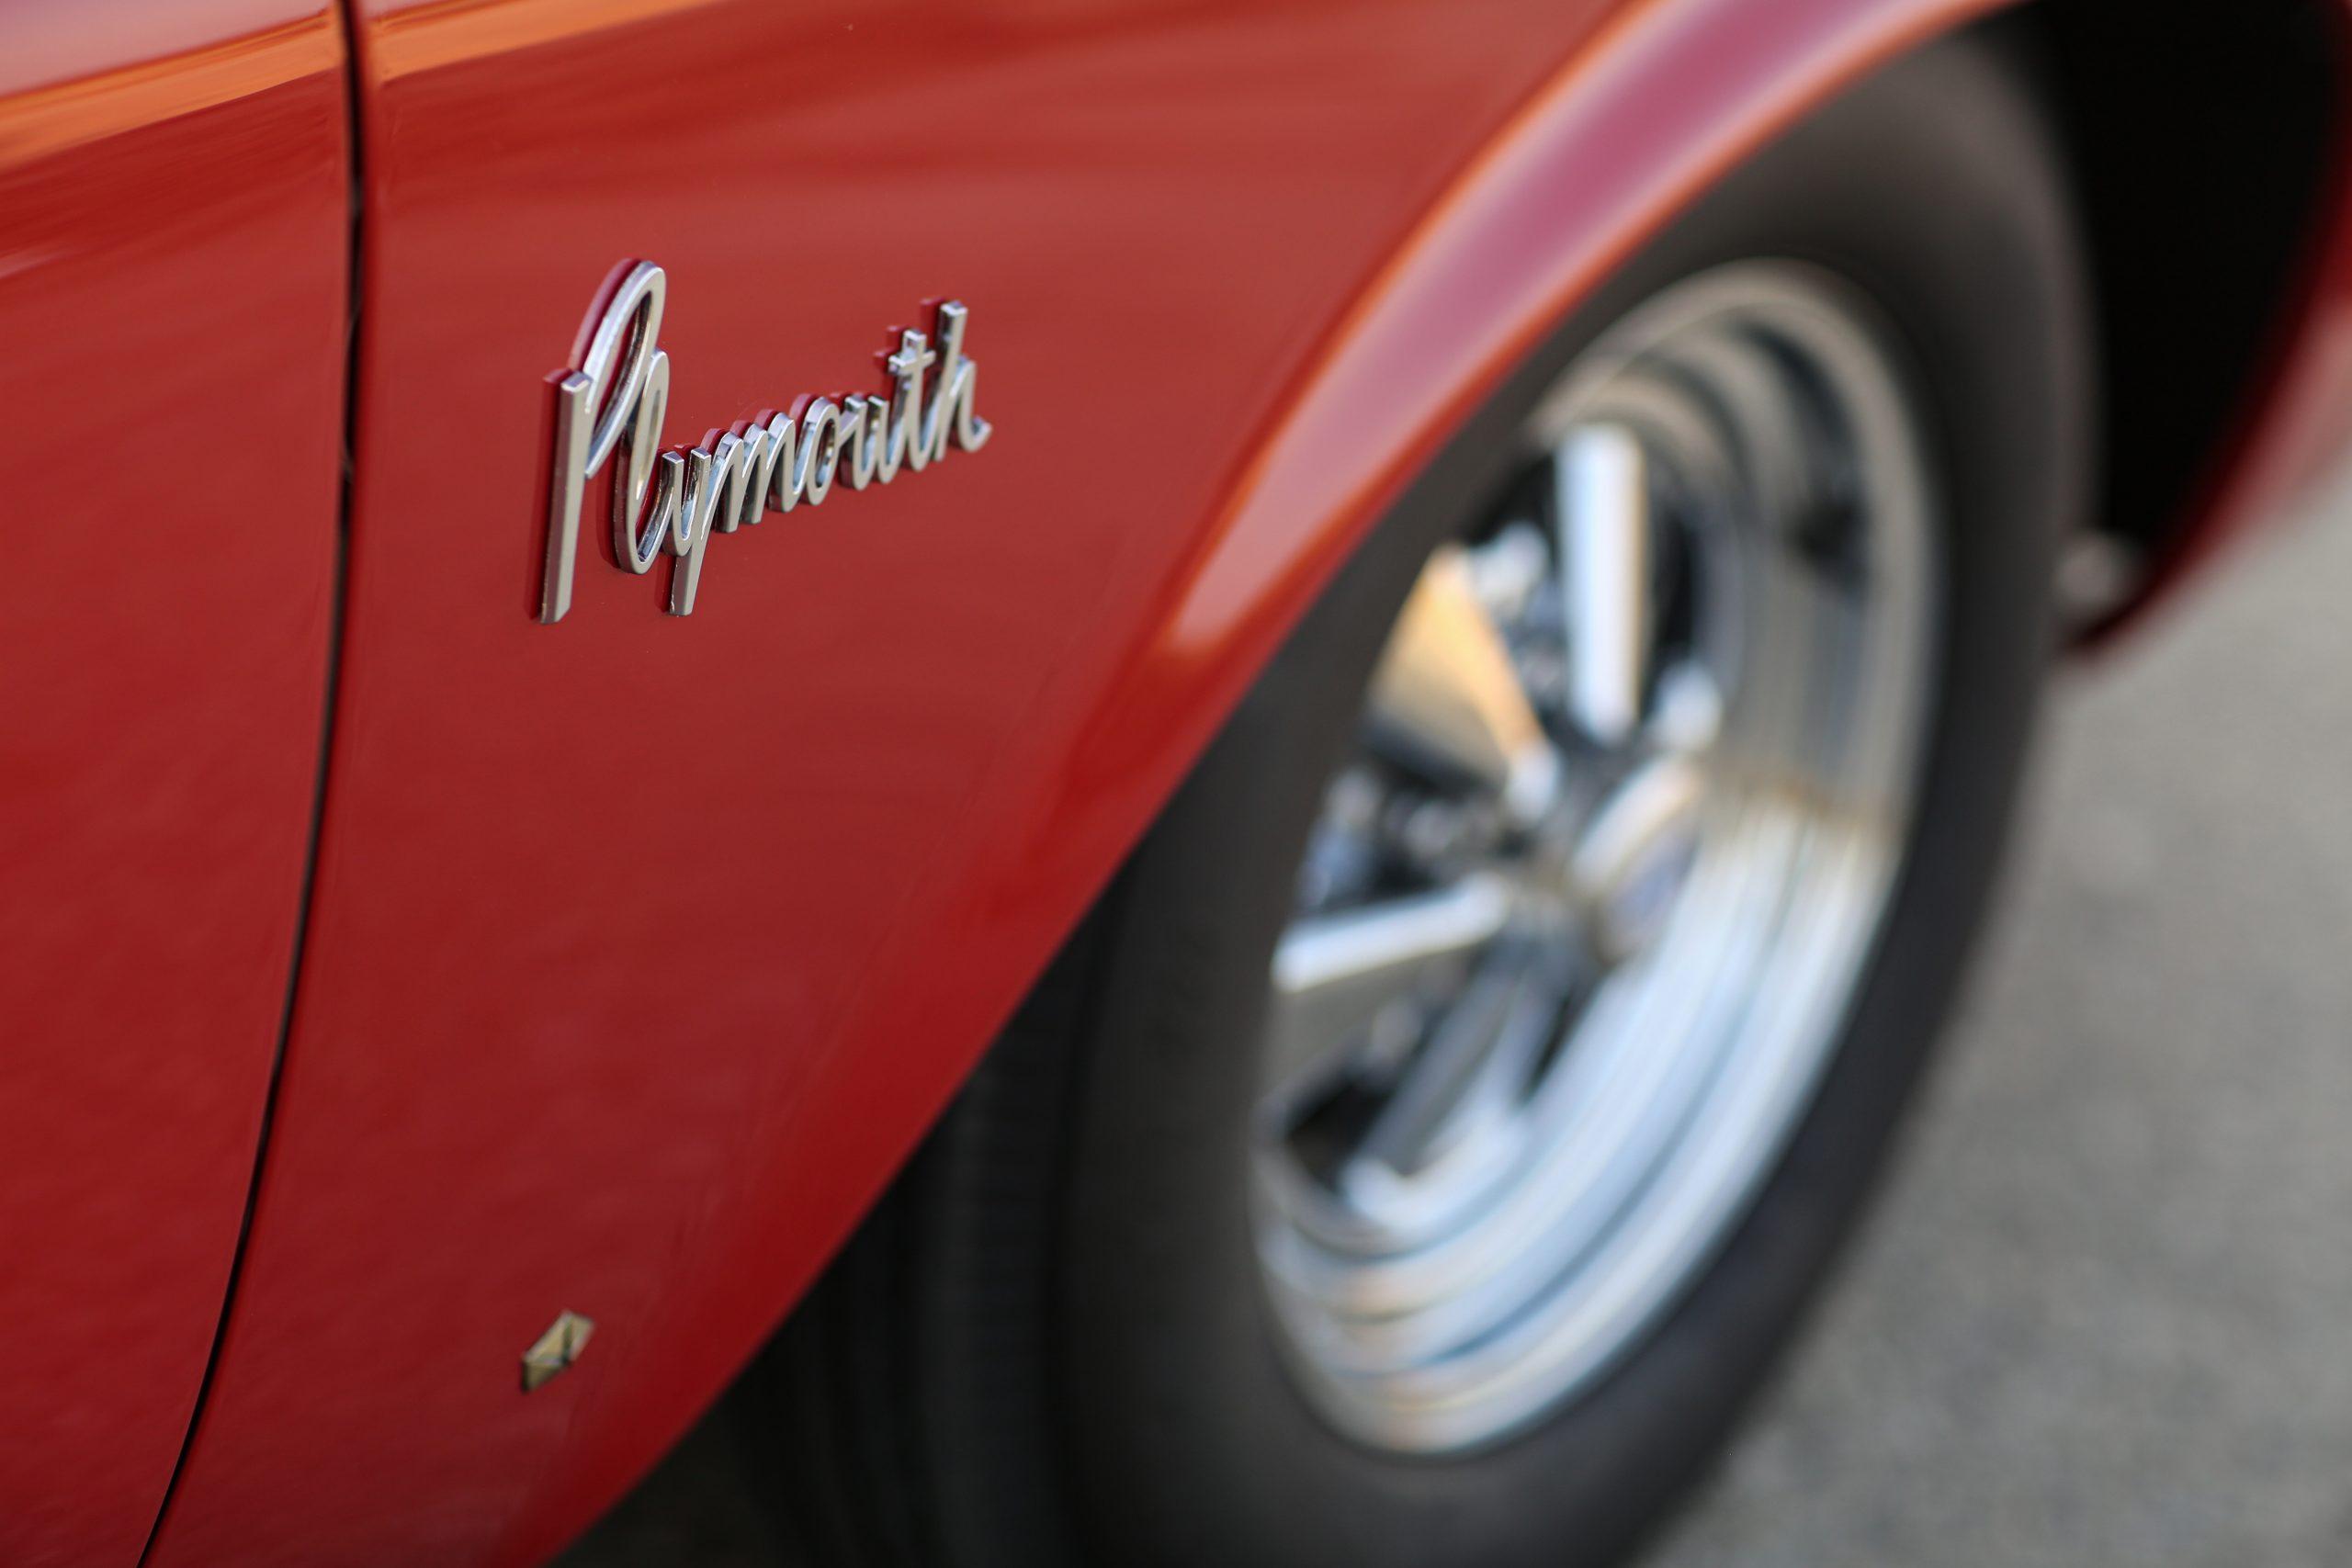 1963 Plymouth 426 Max Wedge lightweight emblem